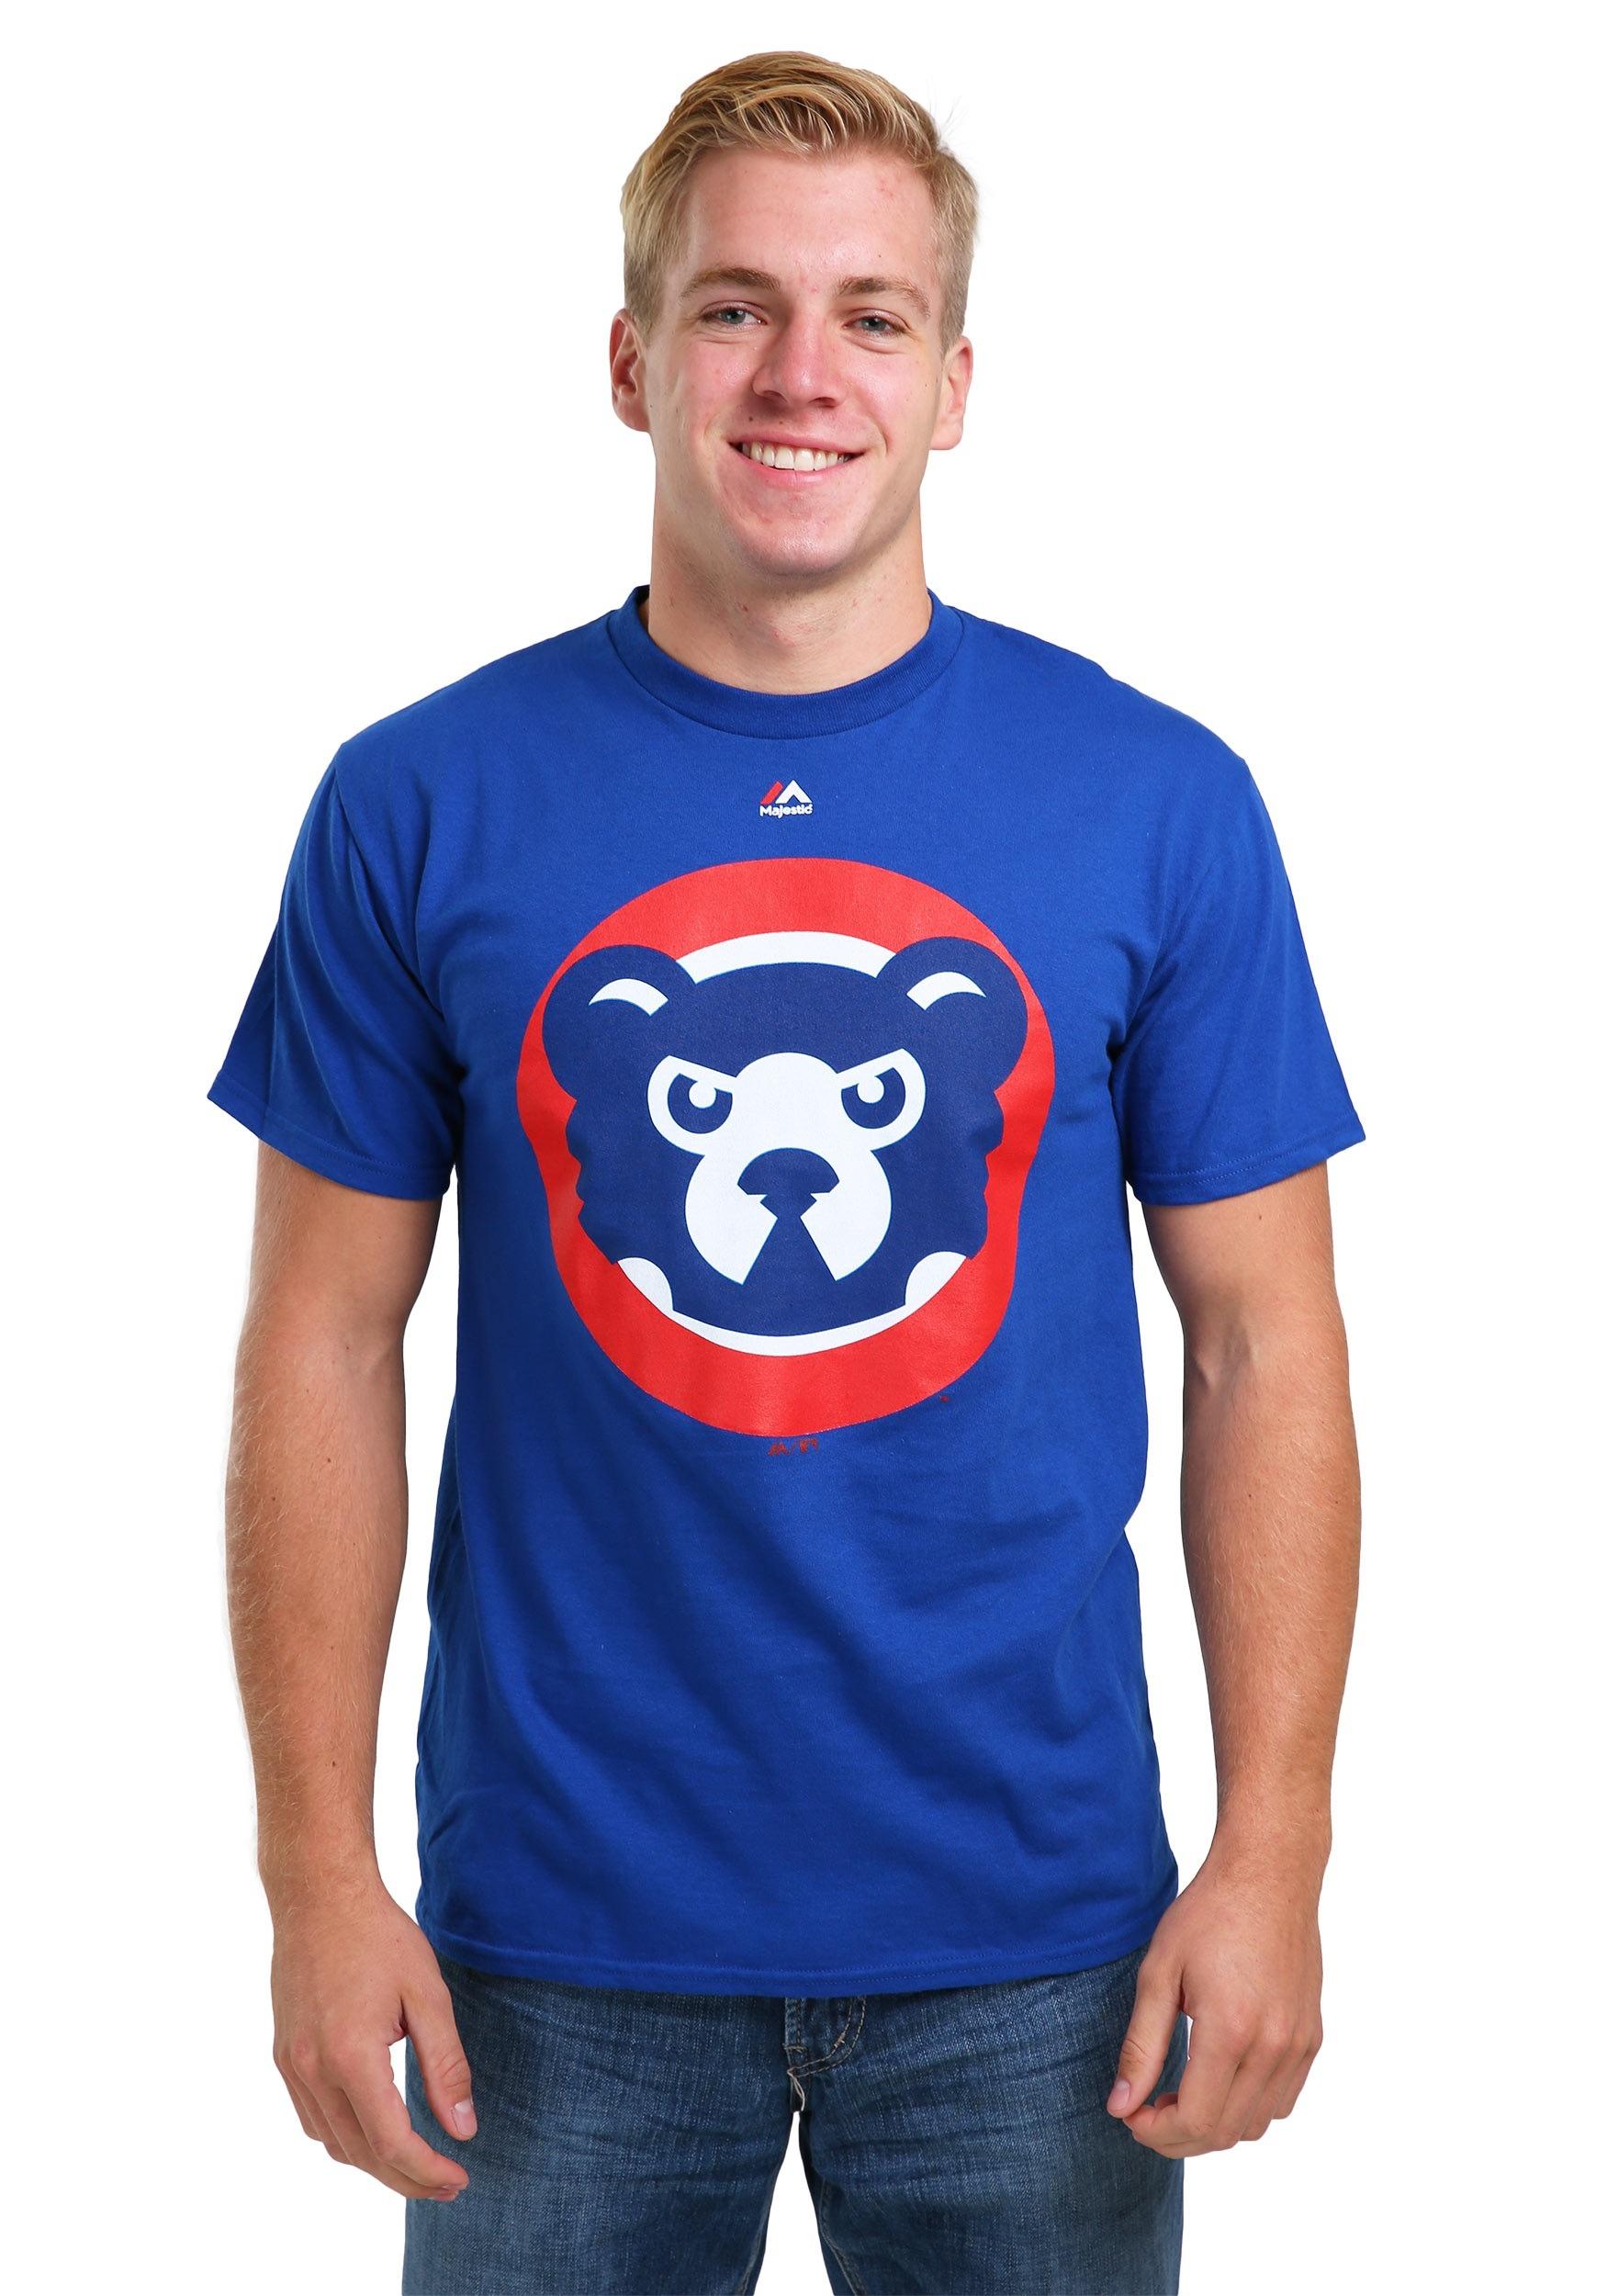 Chicago Cubs Cooperstown Logo T-Shirt for Men 66b171902